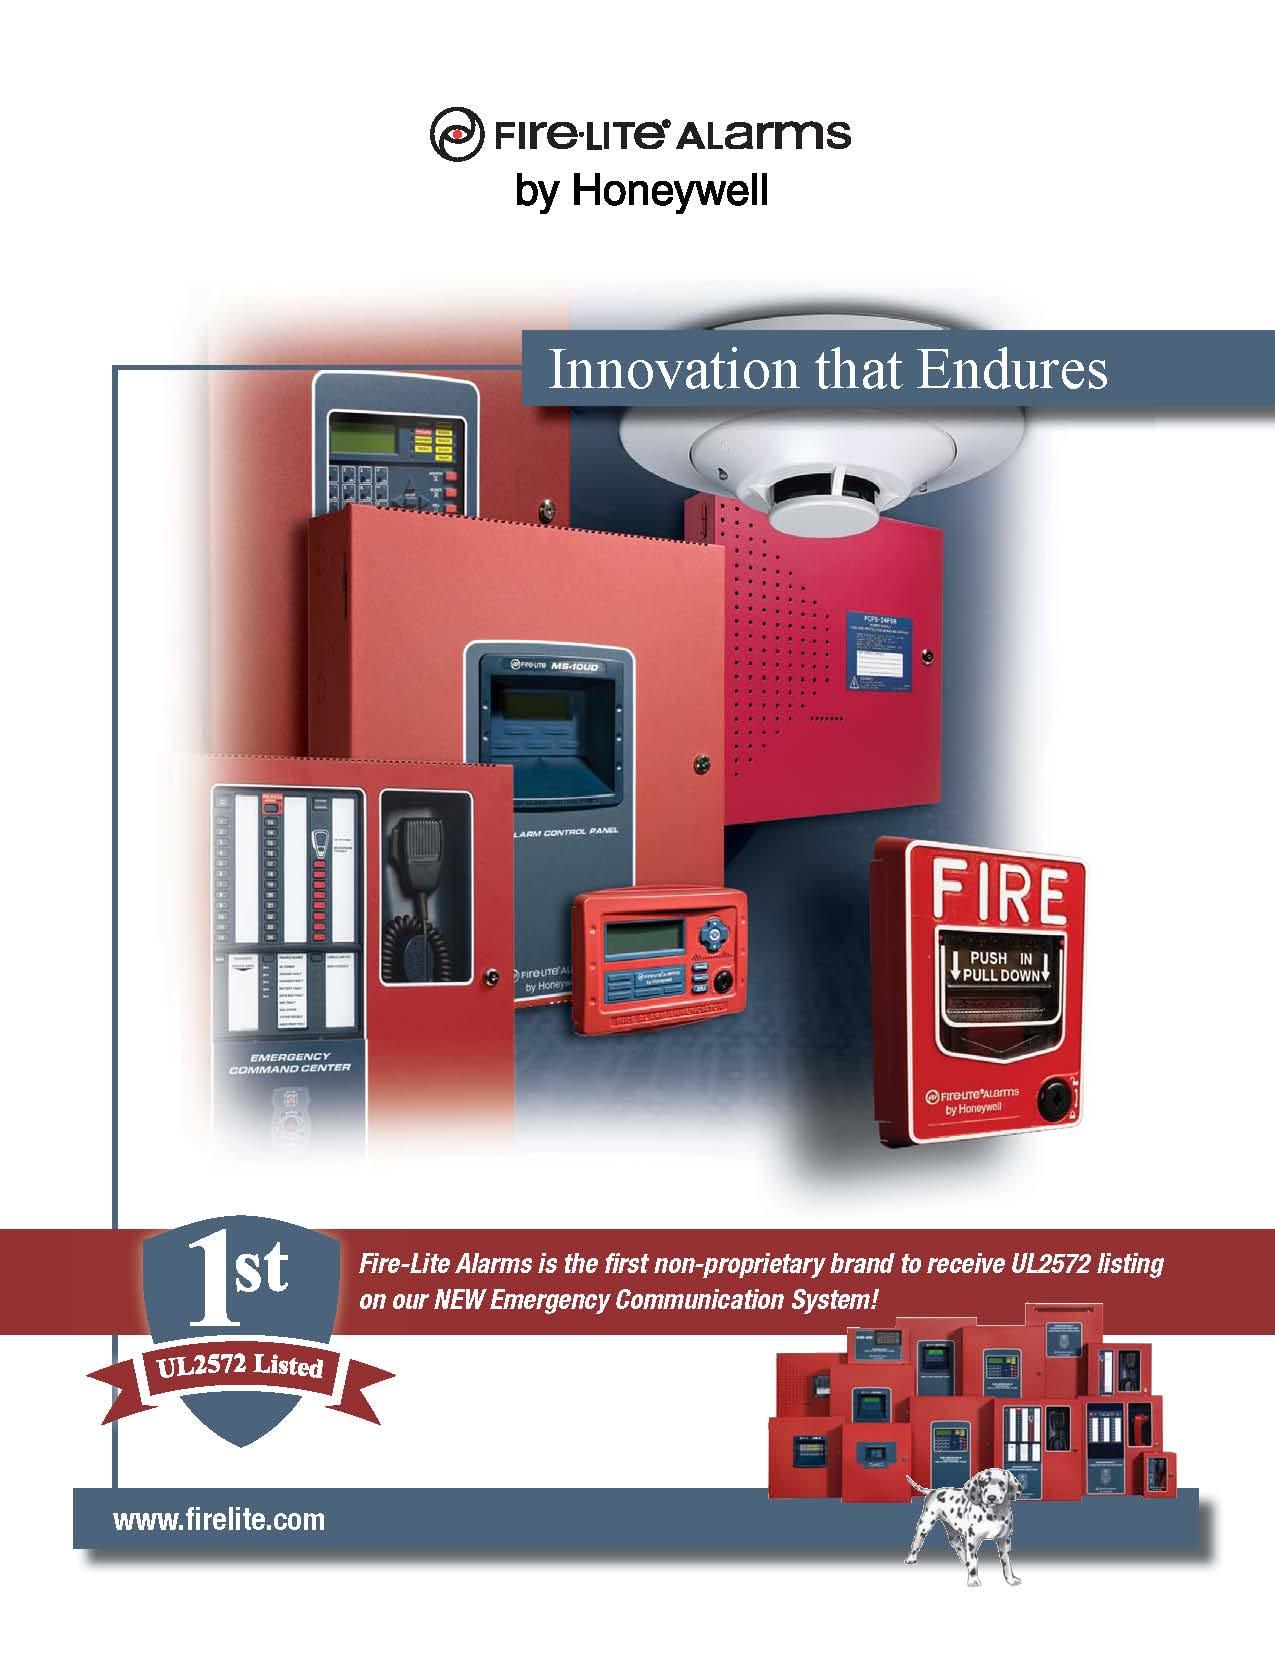 http://firealarmsboston.com/wp-content/uploads/2014/06/FireLite-Catalog-cover.jpg